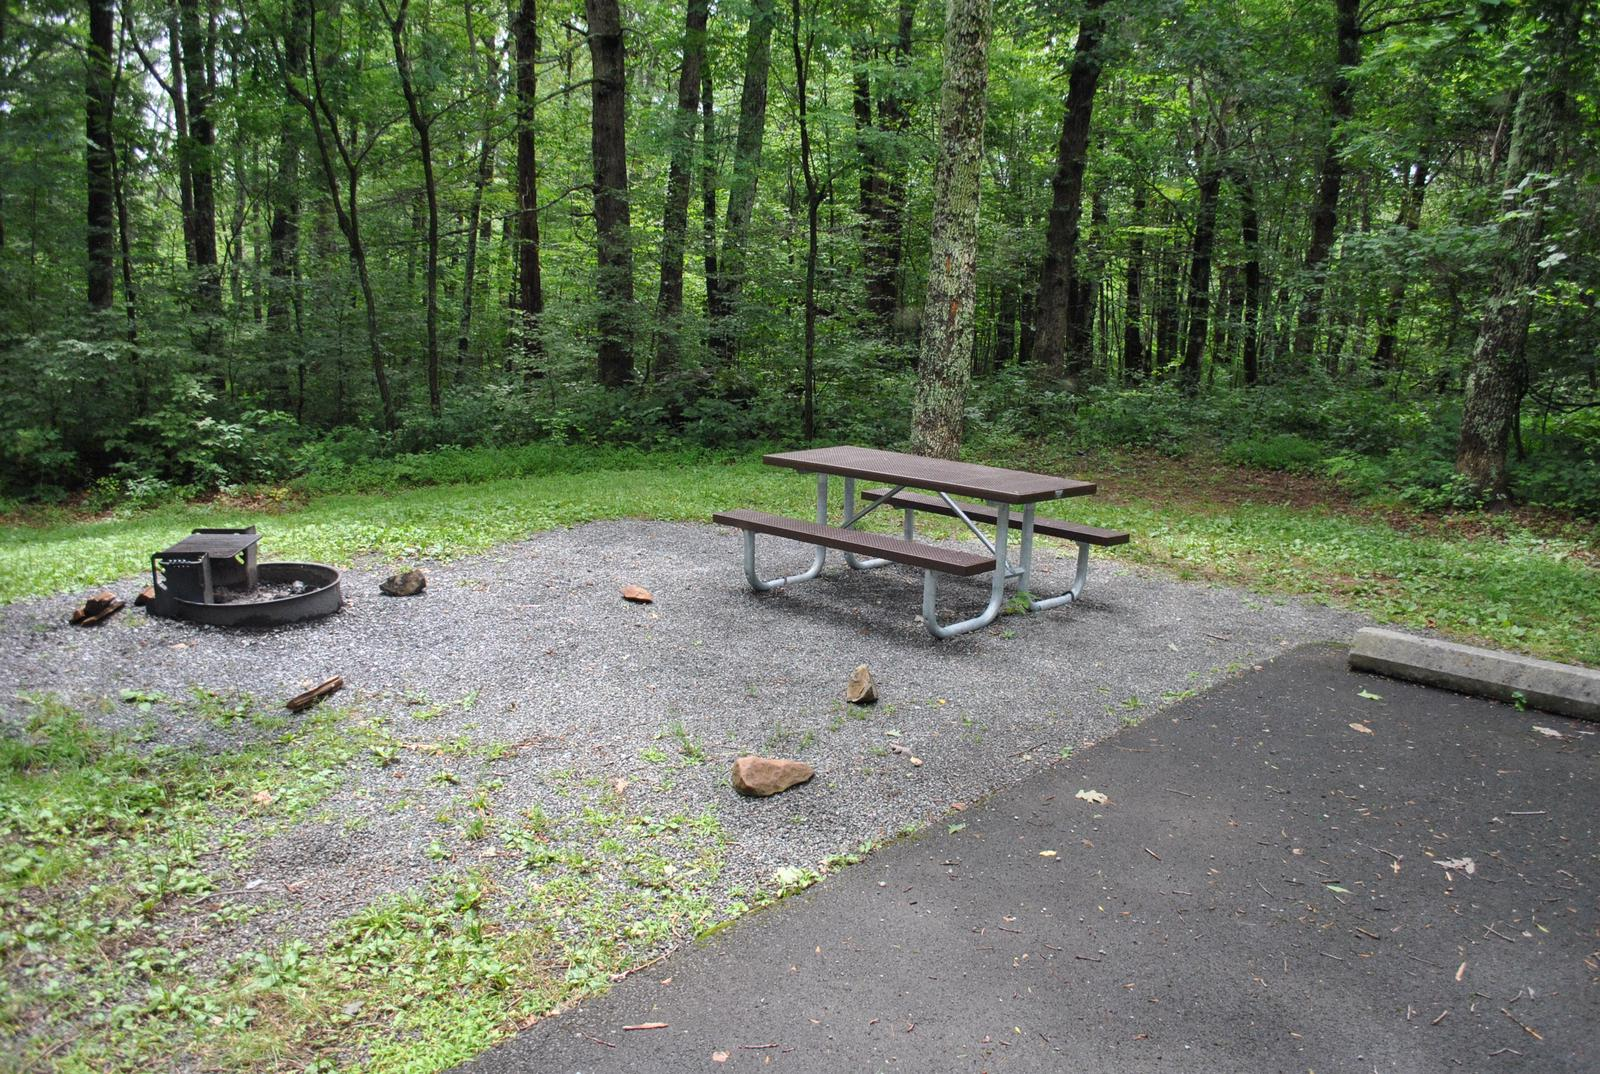 Mathews Arm Campground – Site A113